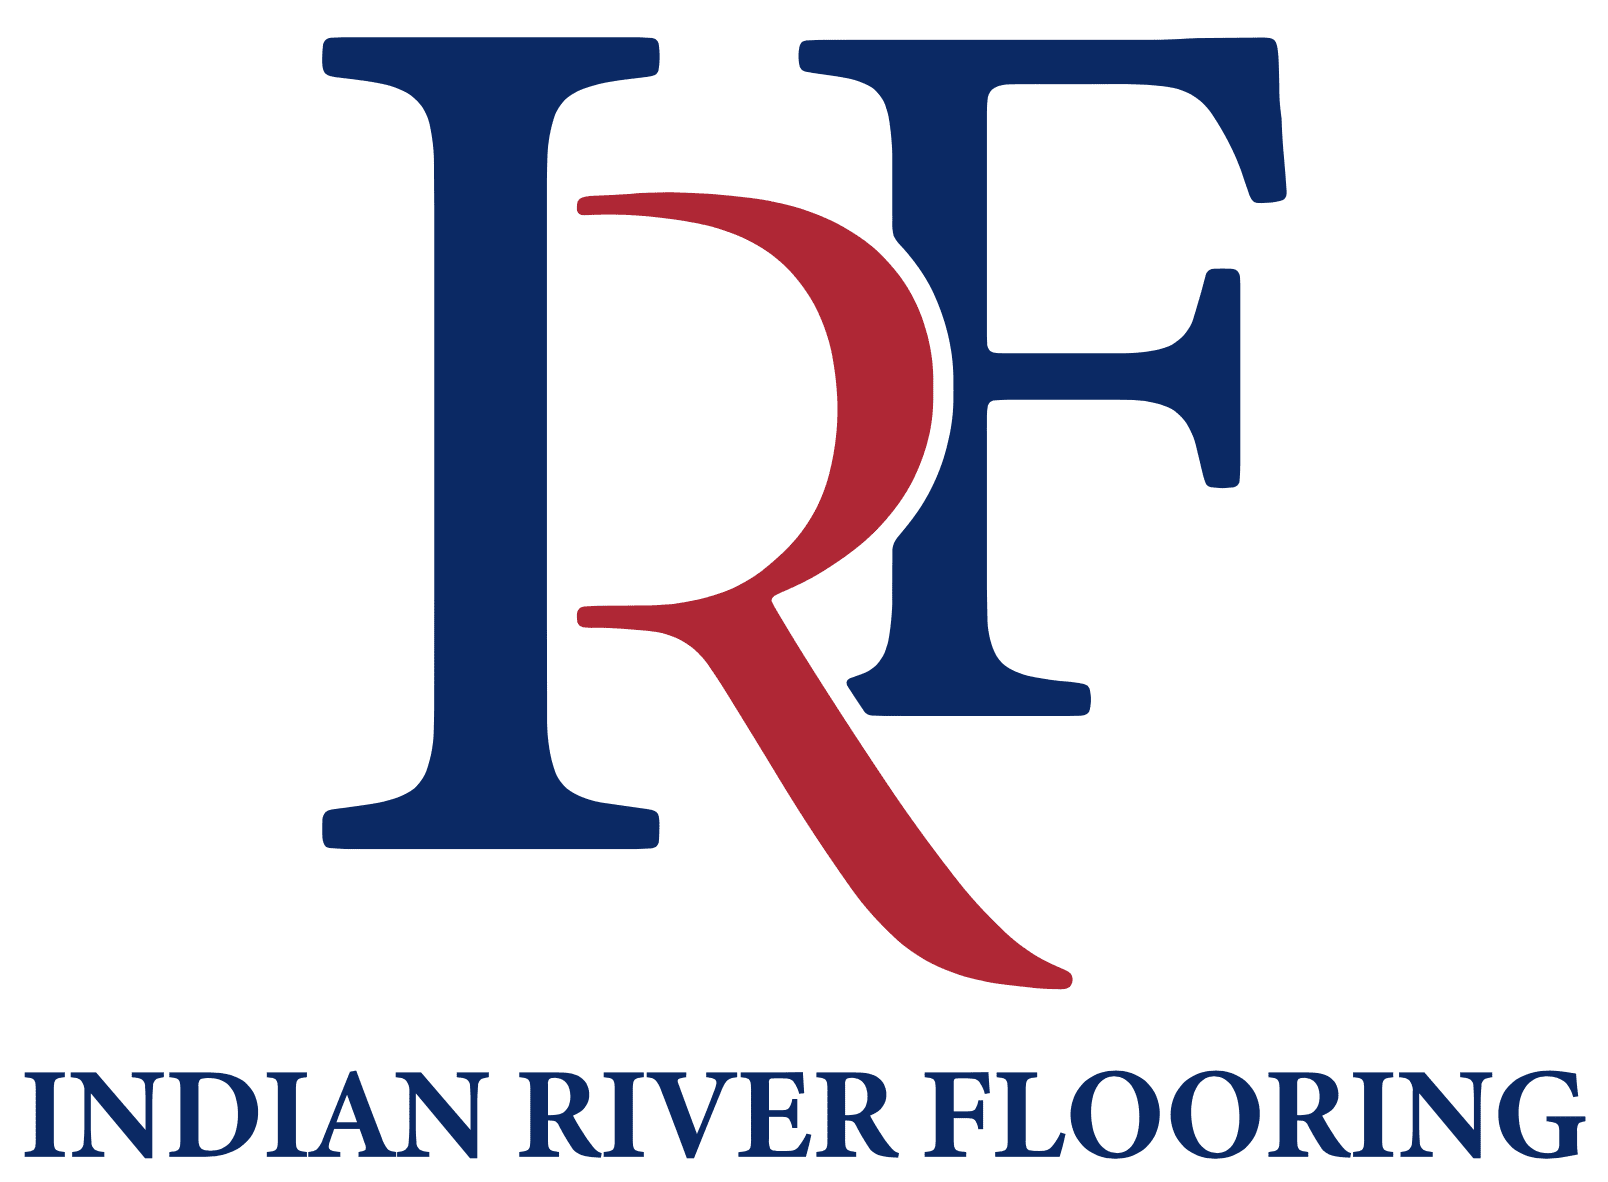 Indian River Flooring in Vero Beach, FL